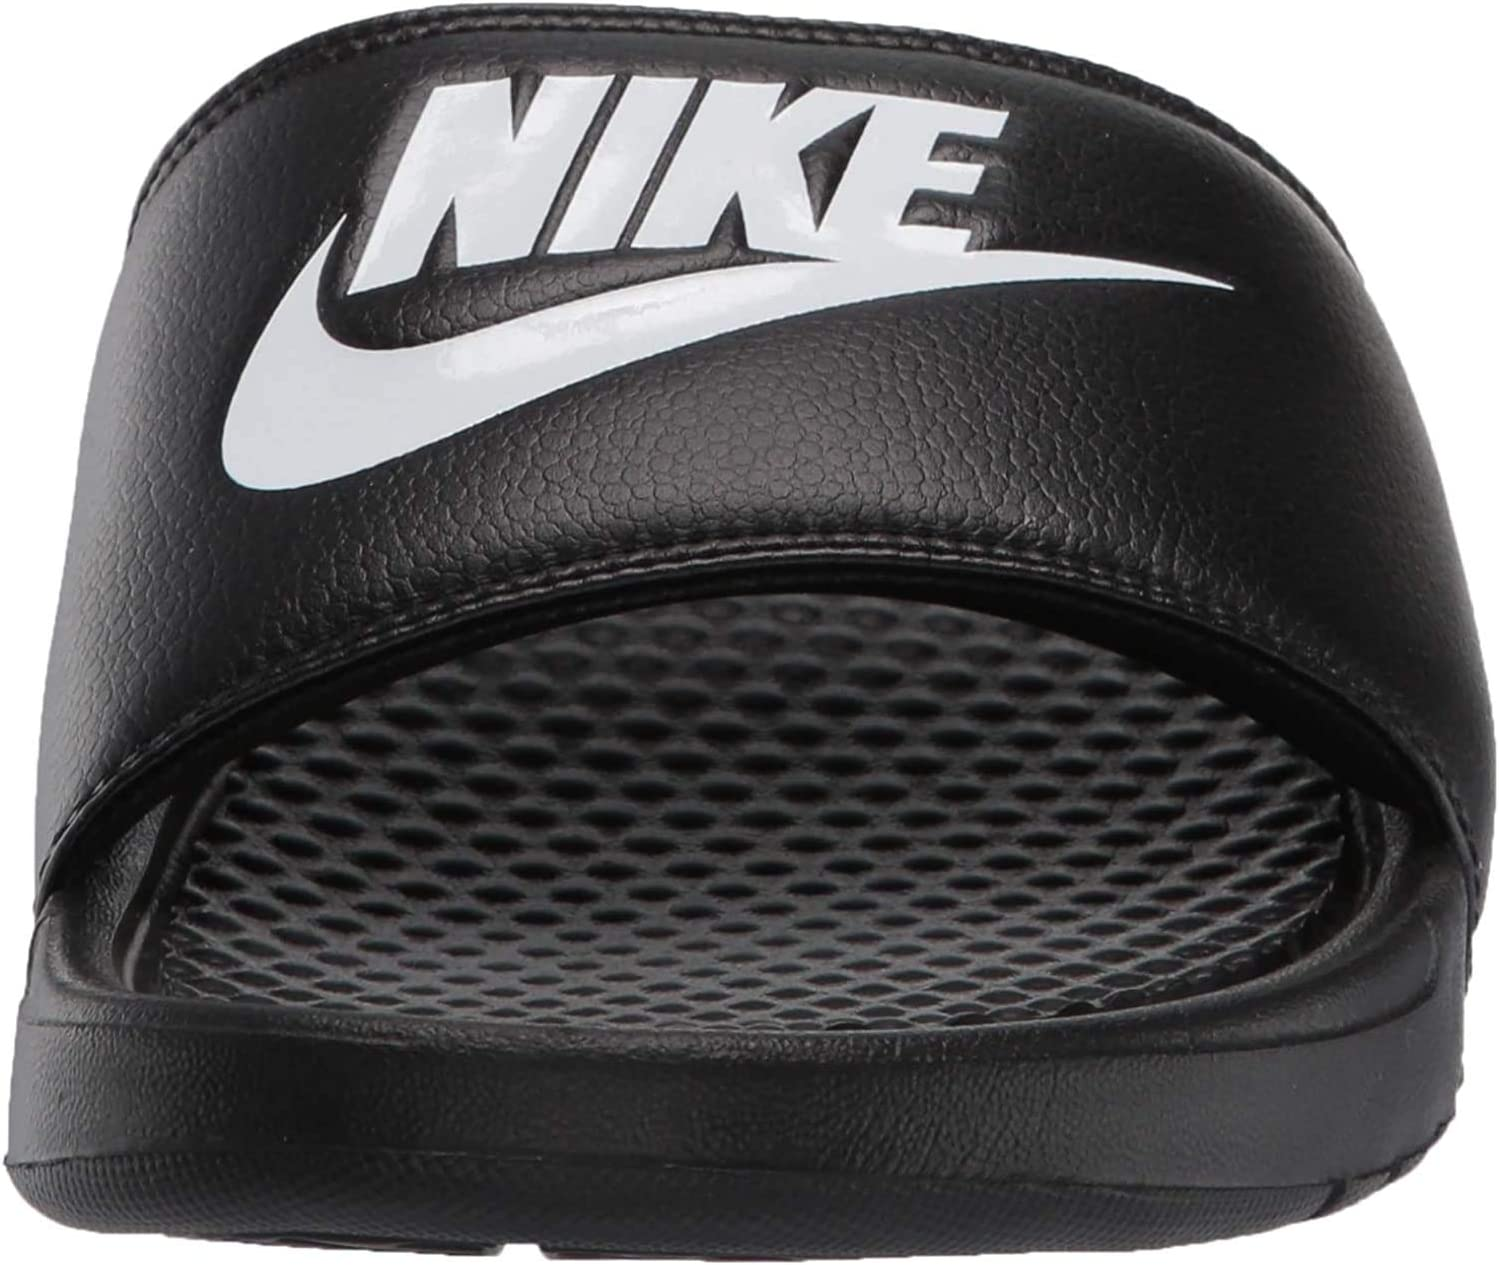 - Benassi Just Do It, Zapatos de Playa y Piscina Hombre, Negro (Black/White 090), 42.5 EU